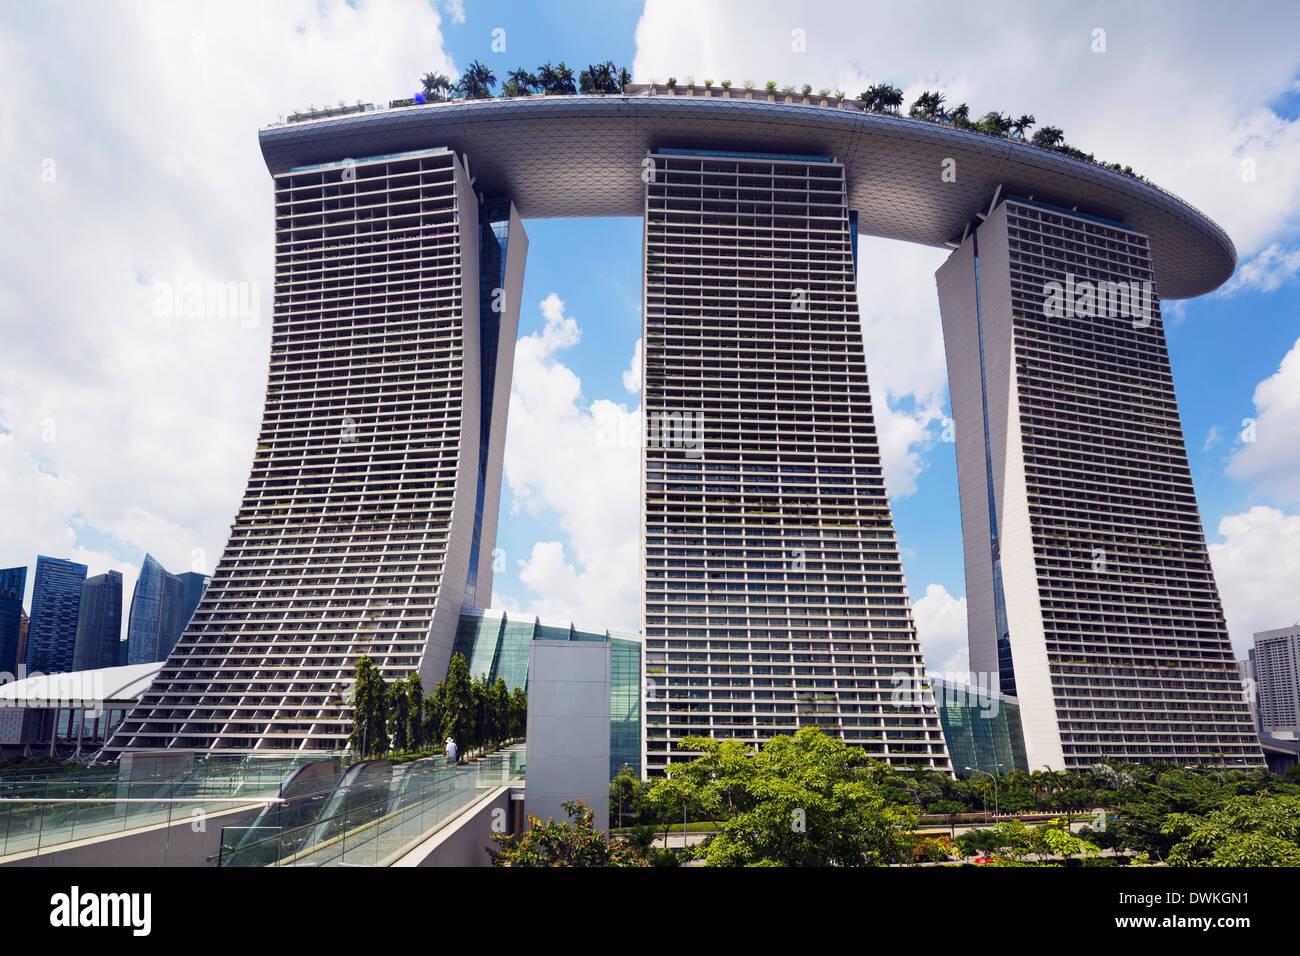 Marina Bay Sands Hotel, Singapore, Southeast Asia, Asia - Stock Image